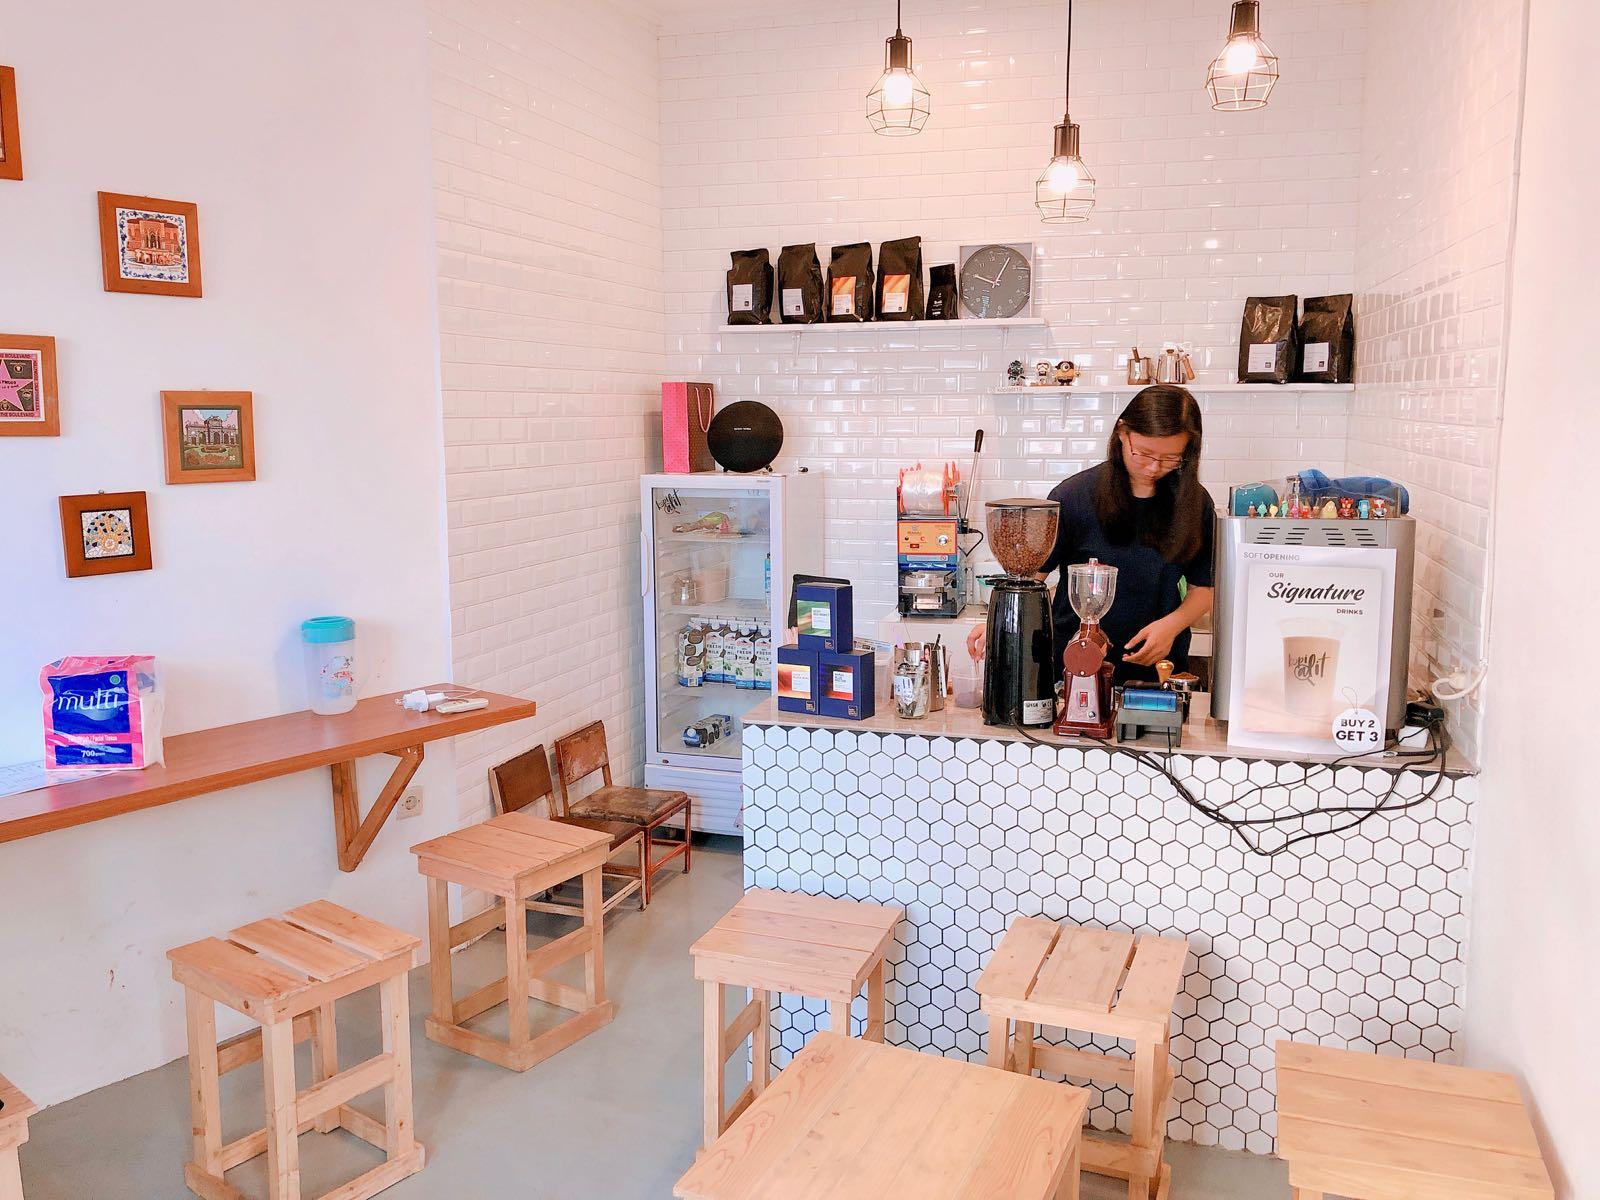 Kopi Alit Coffee Shop Bandung